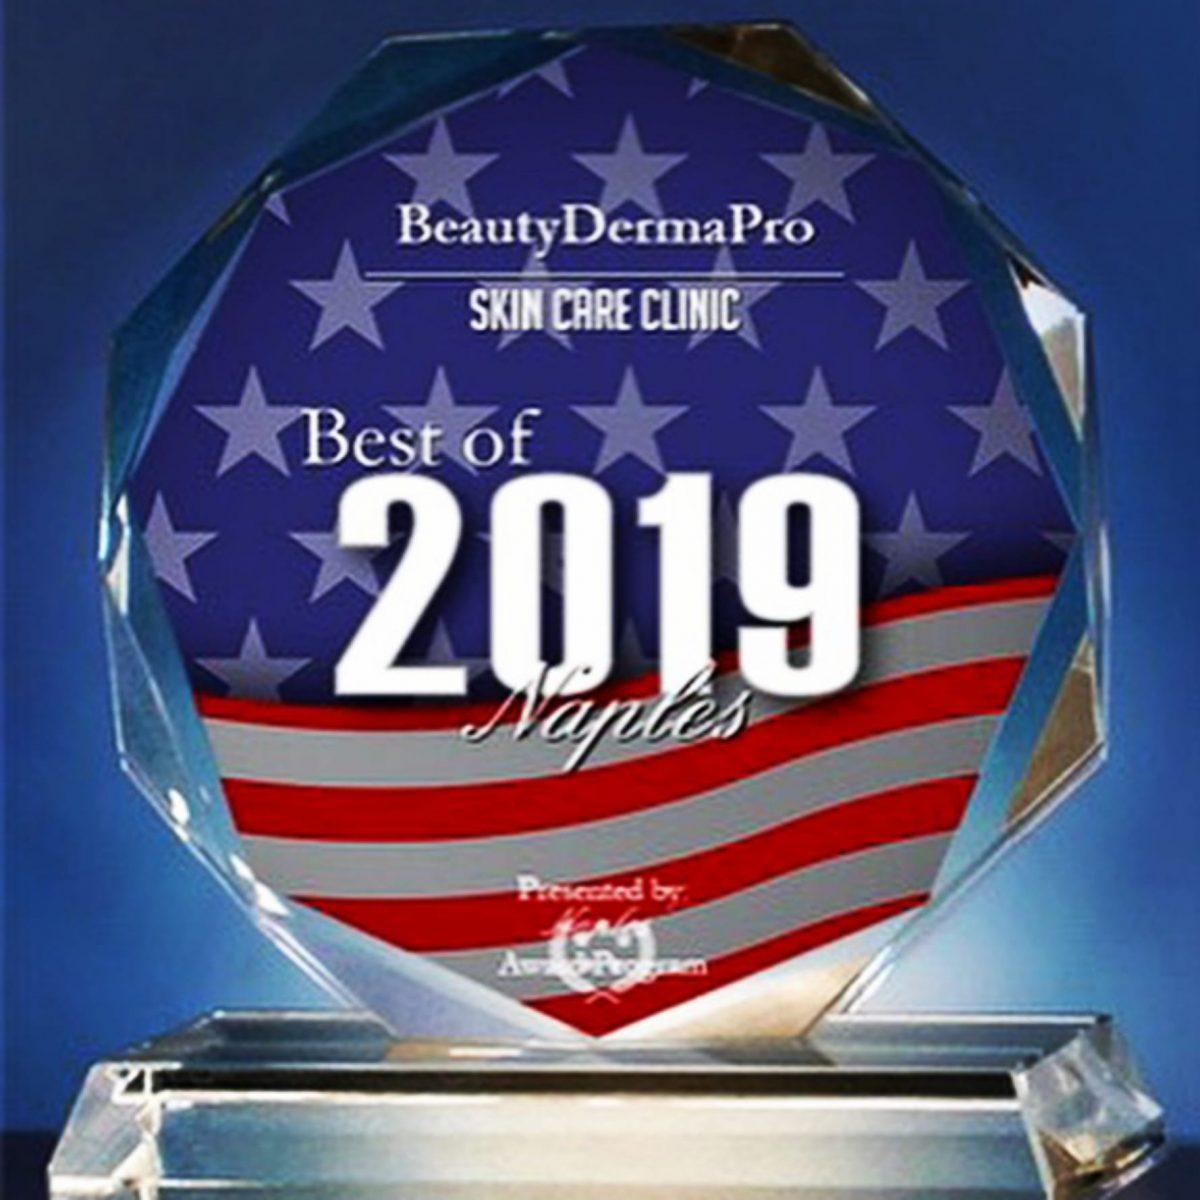 BeautyDermaPro Receives 2019 Best of Naples Award